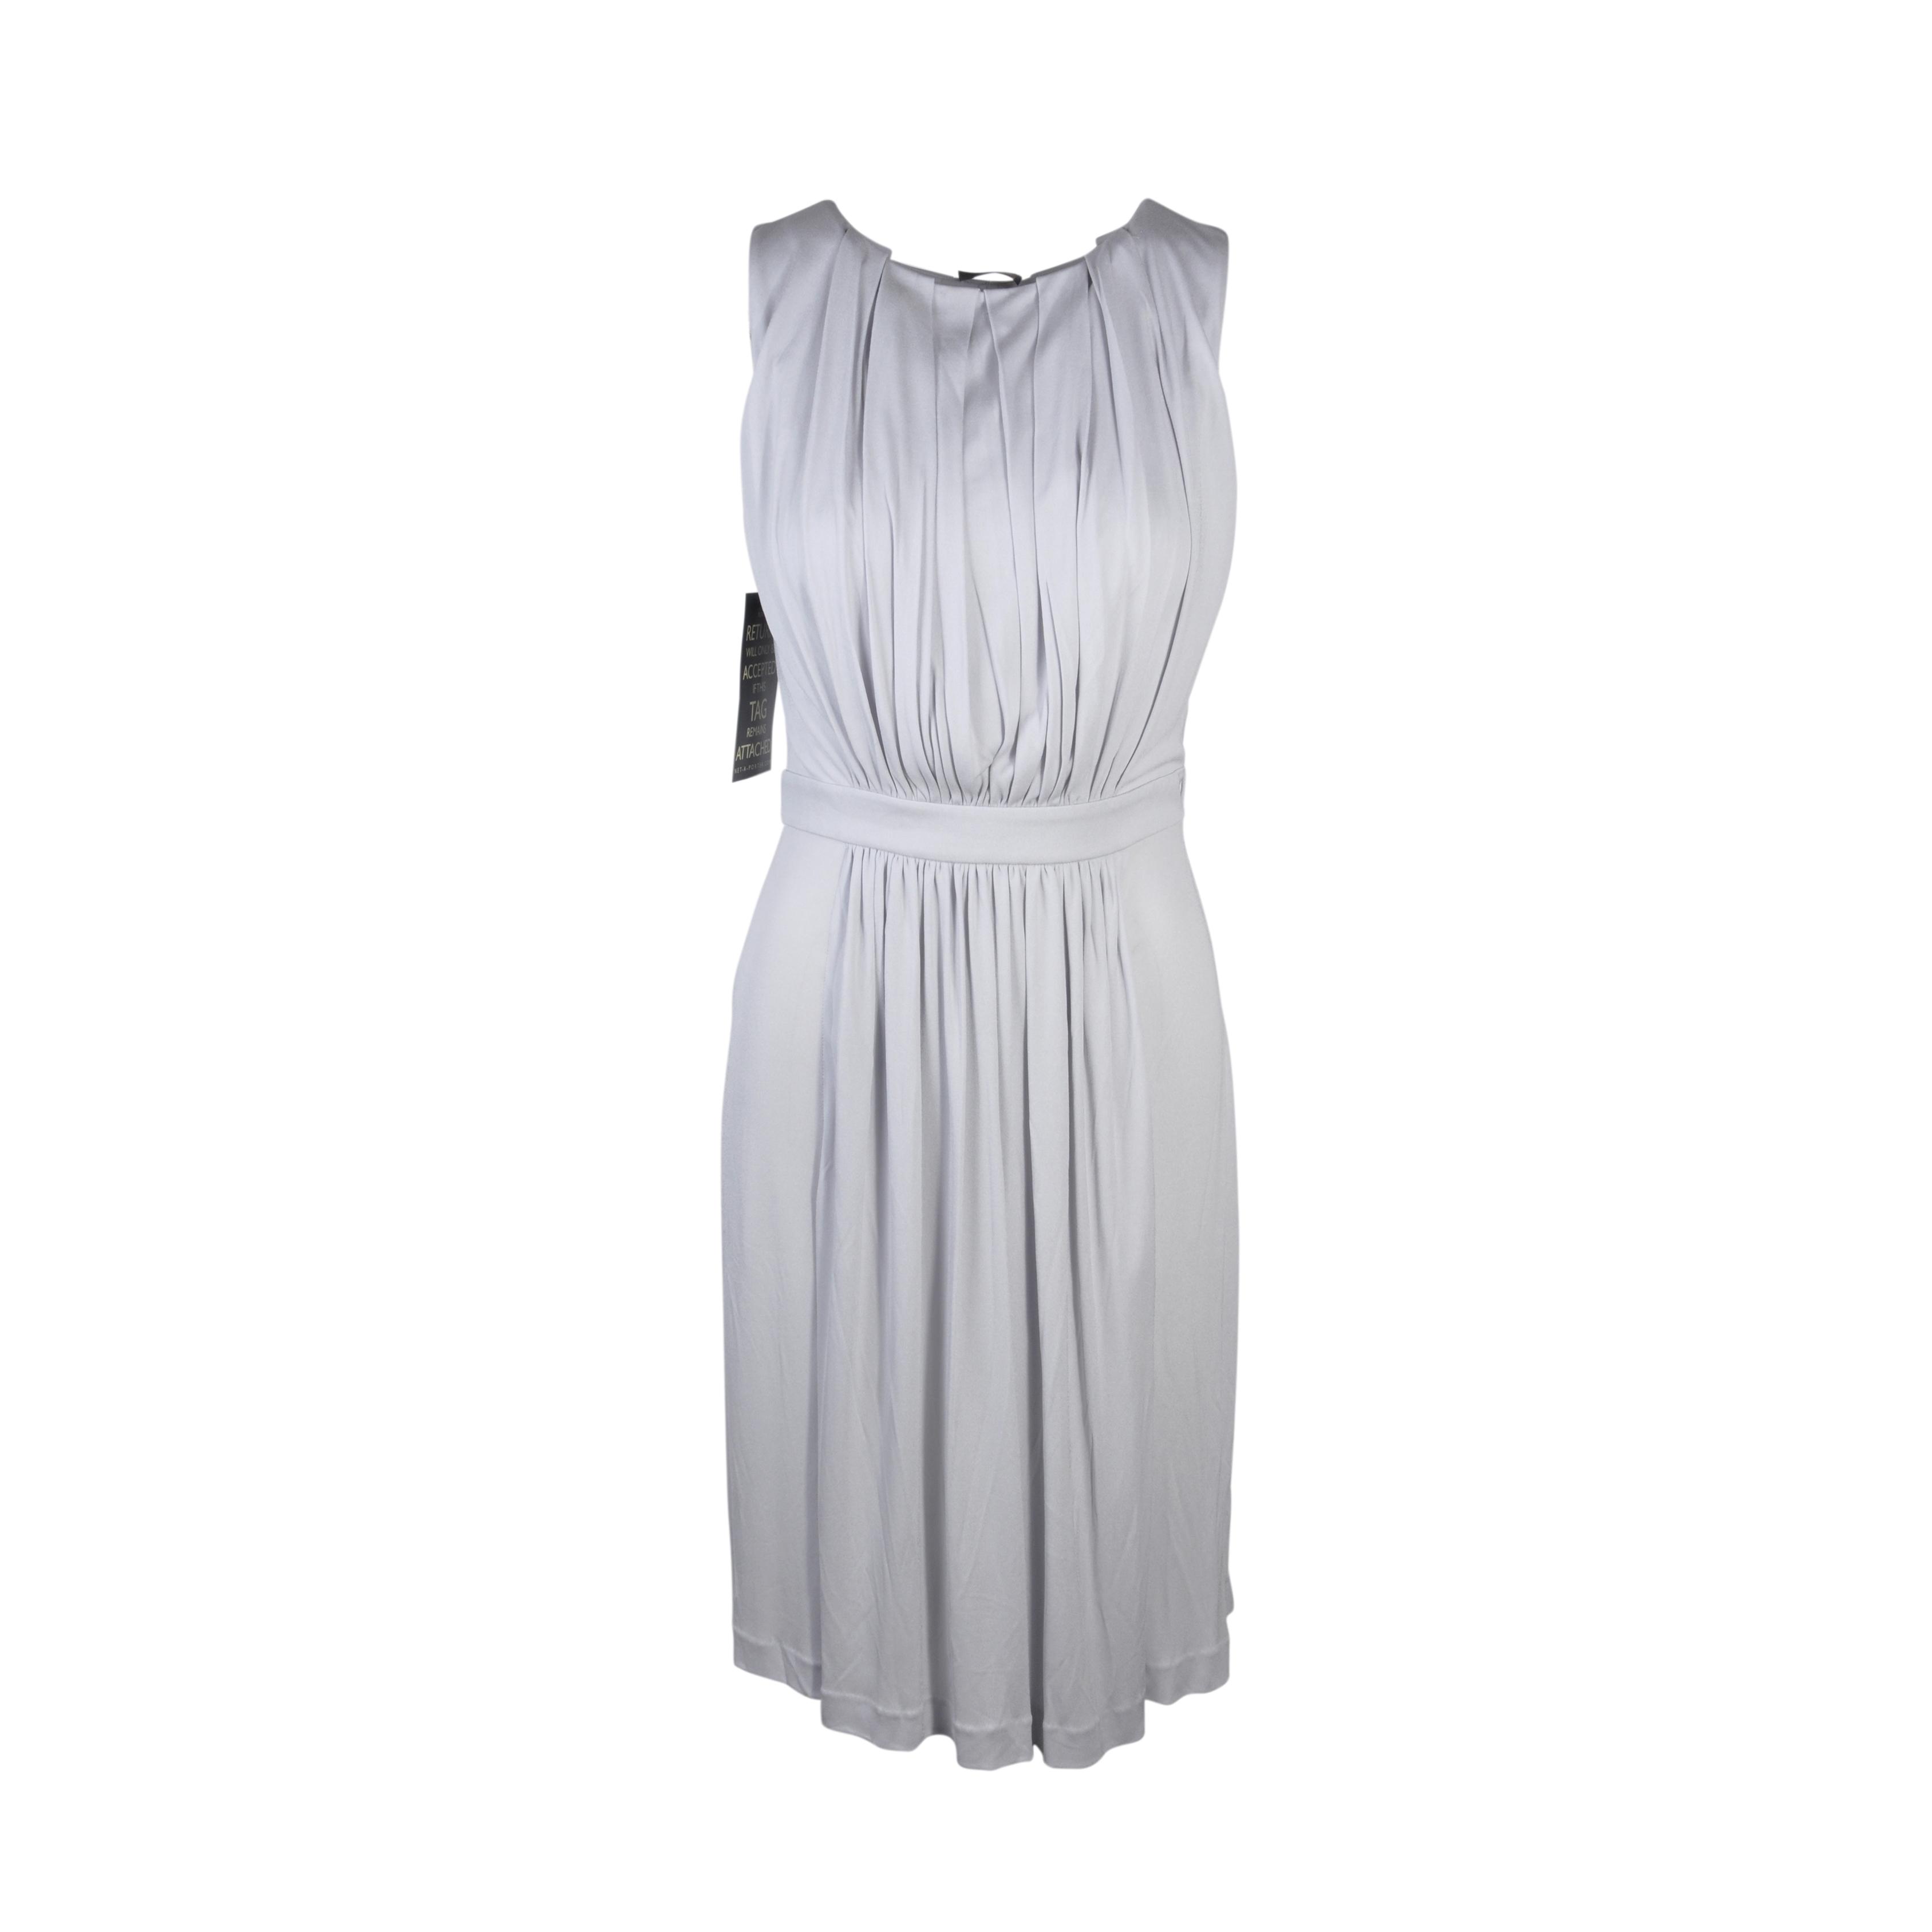 61883bb6cfcf6 Authentic Second Hand Fendi Draped Sleeveless Dress (PSS-074-00023 ...